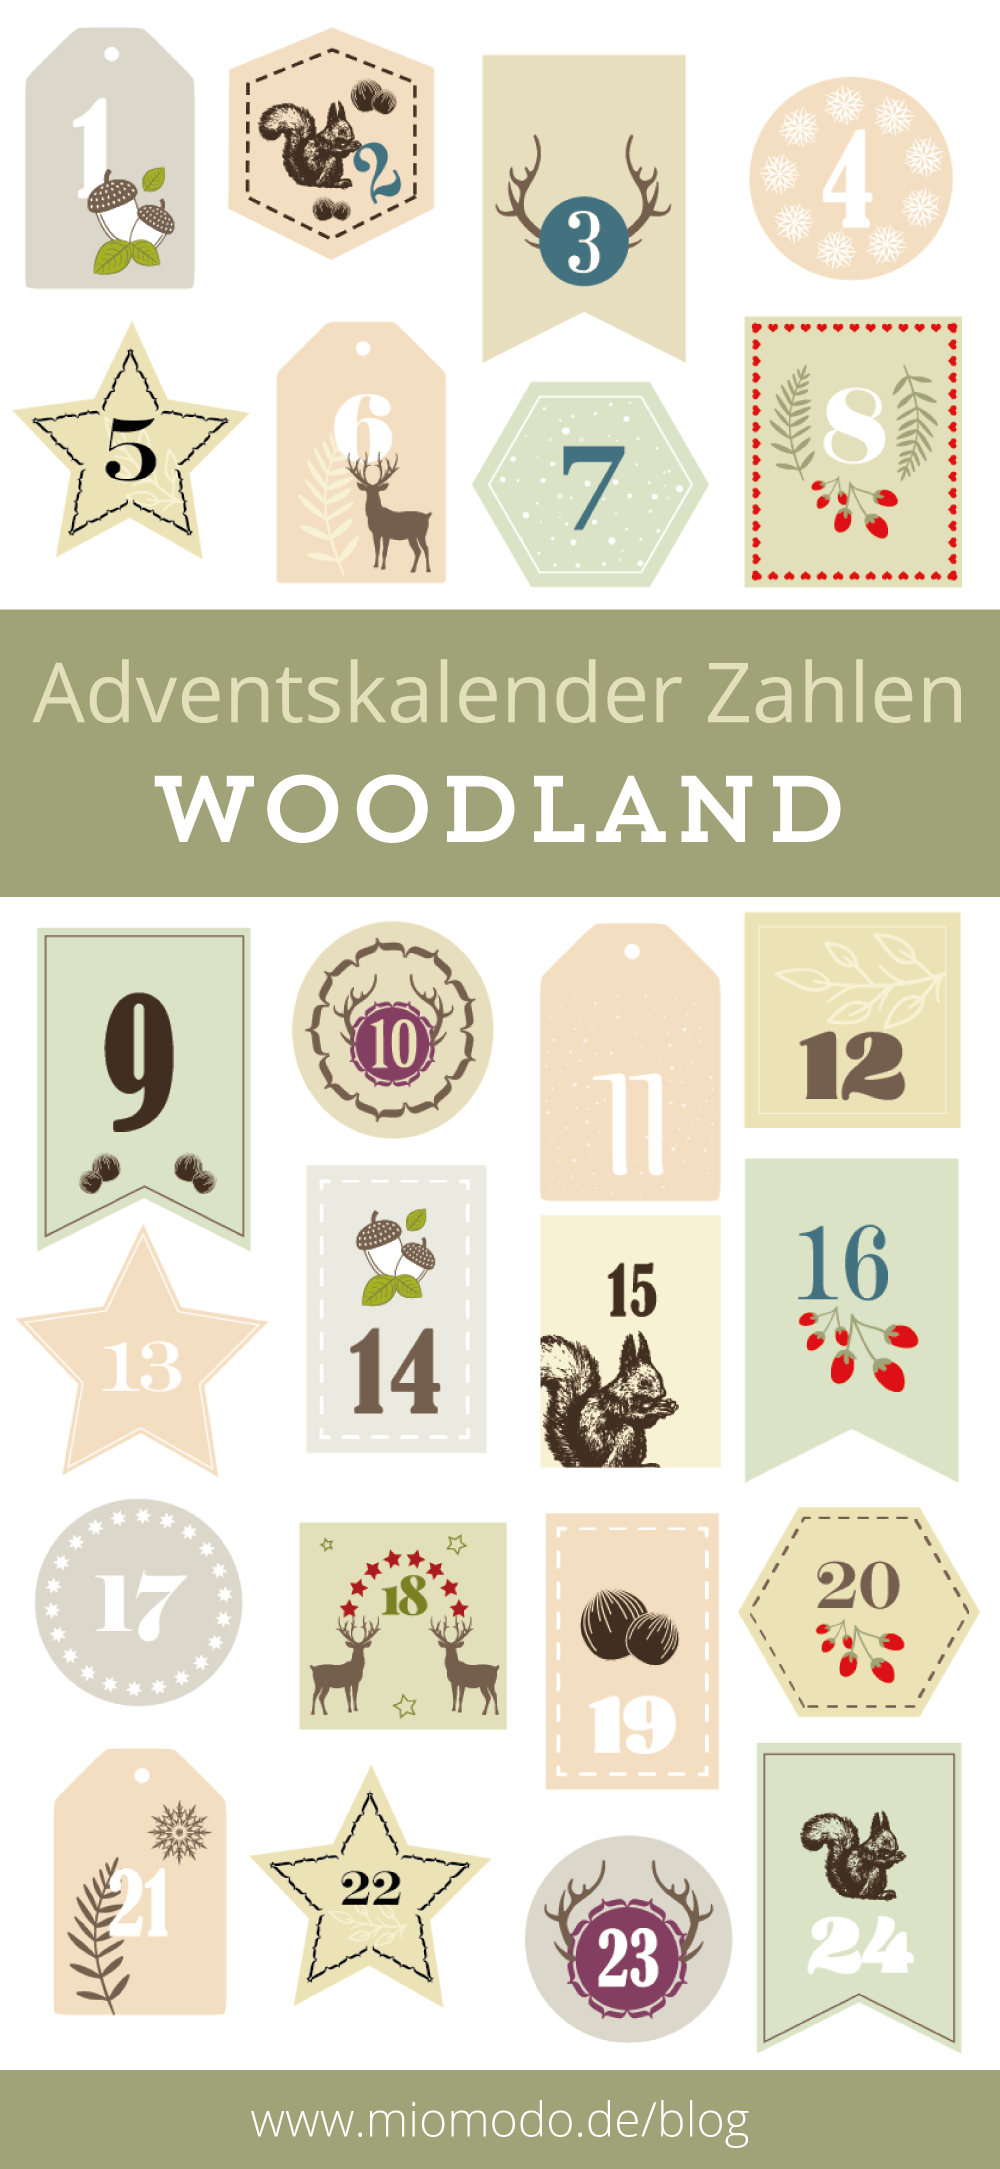 Diy Adventskalender Zahlen Woodland різдвяний календар